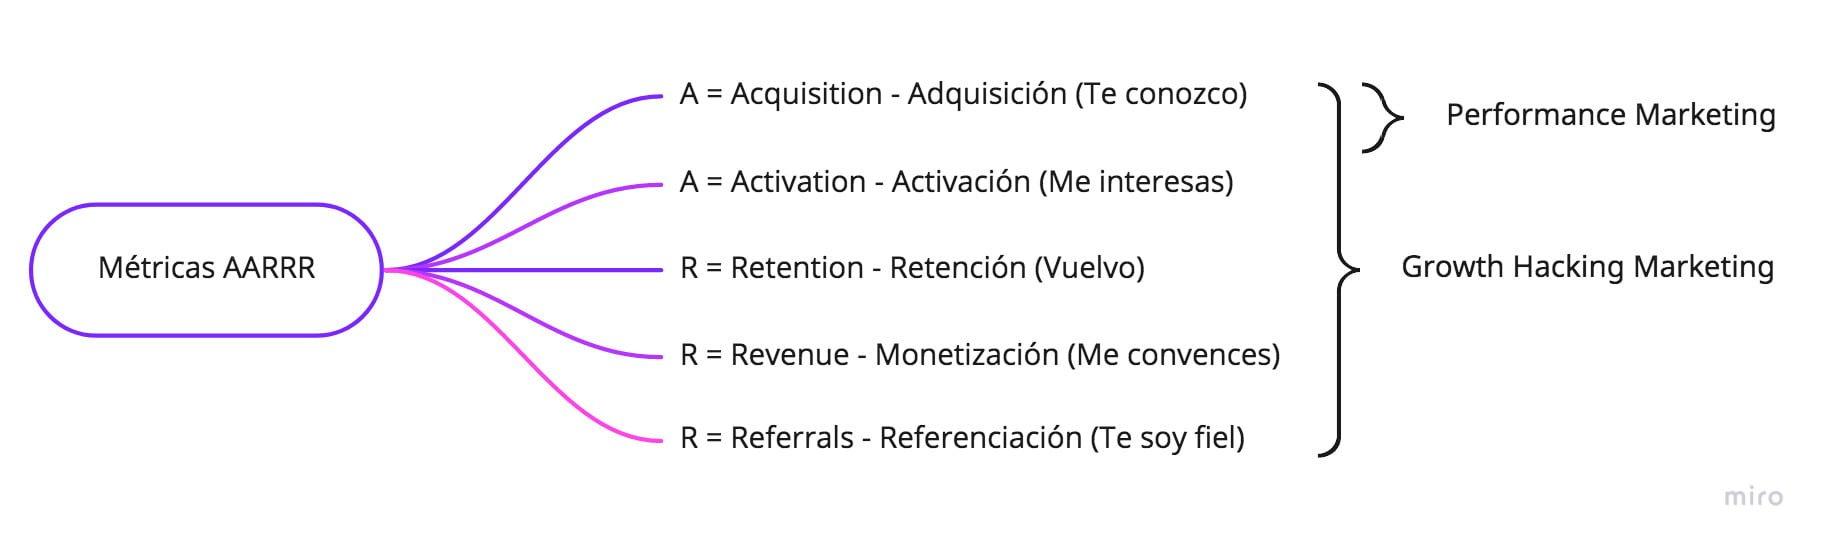 Embudo conceptual que sigue 5 pasos: adquisición, activación, retención, monetización, referenciación. (AARRR)